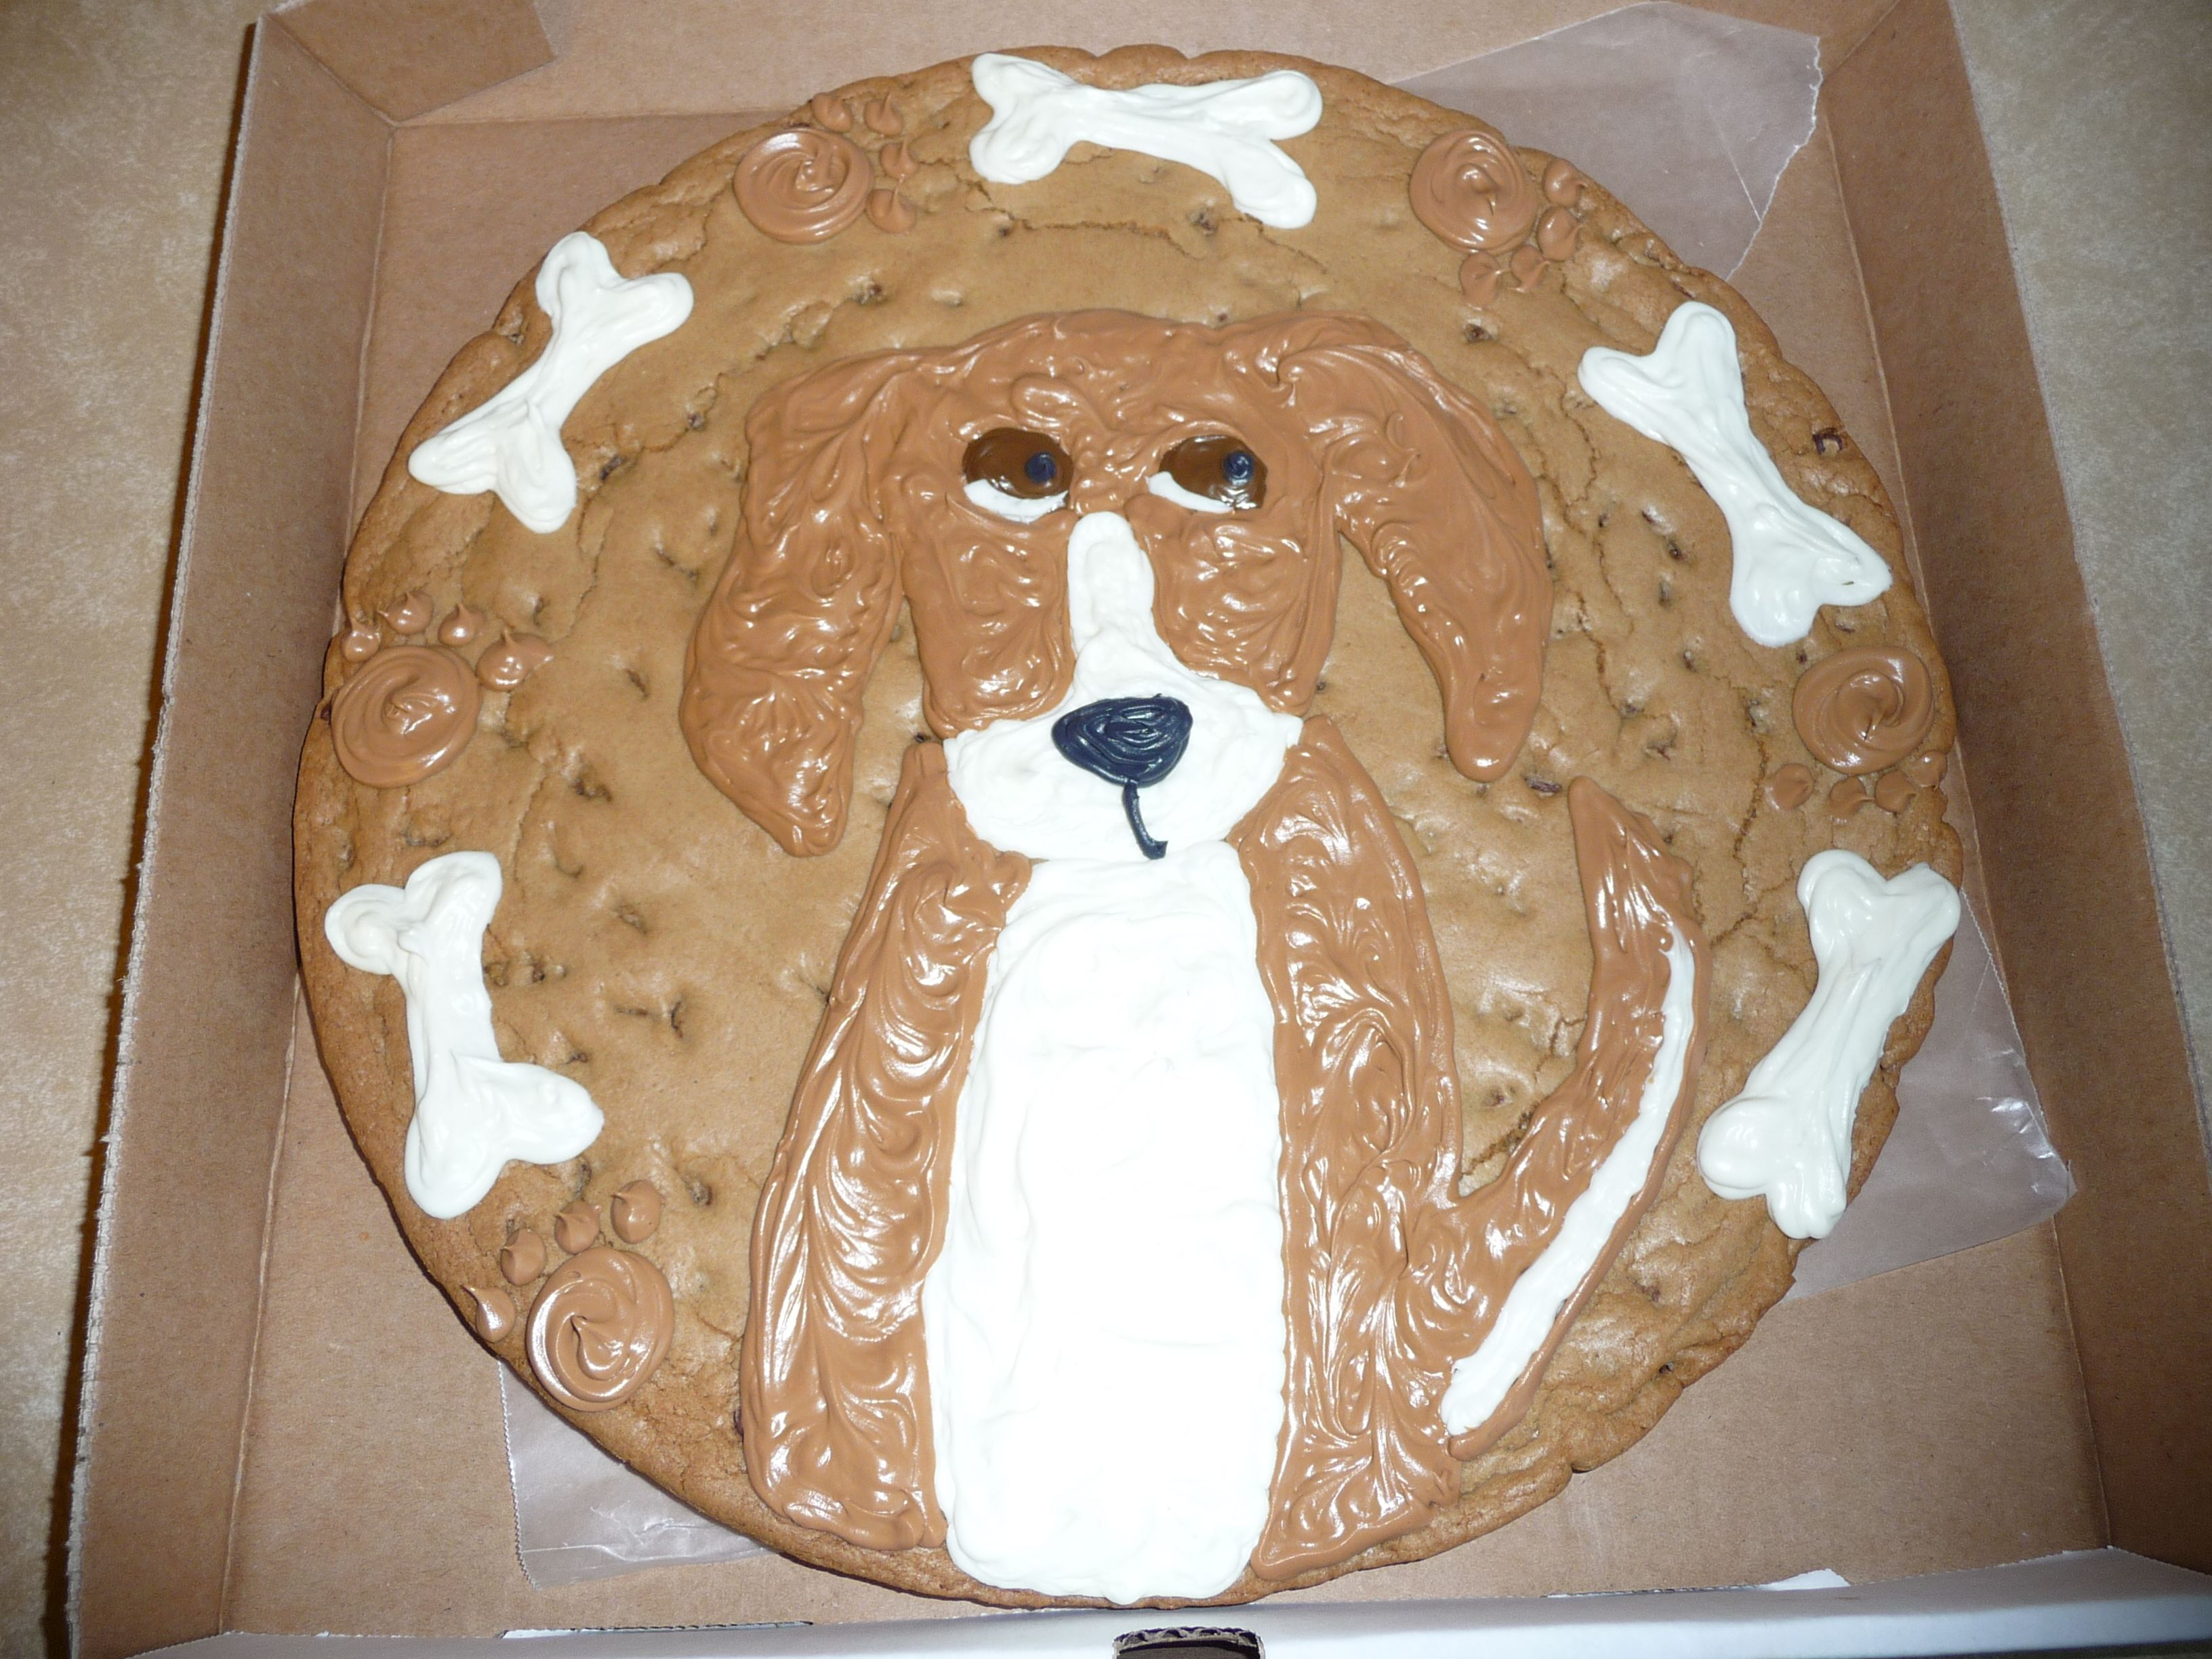 Pin Beagle Puppy Kitten Cat Dog Edible Birthday Party Cake ...